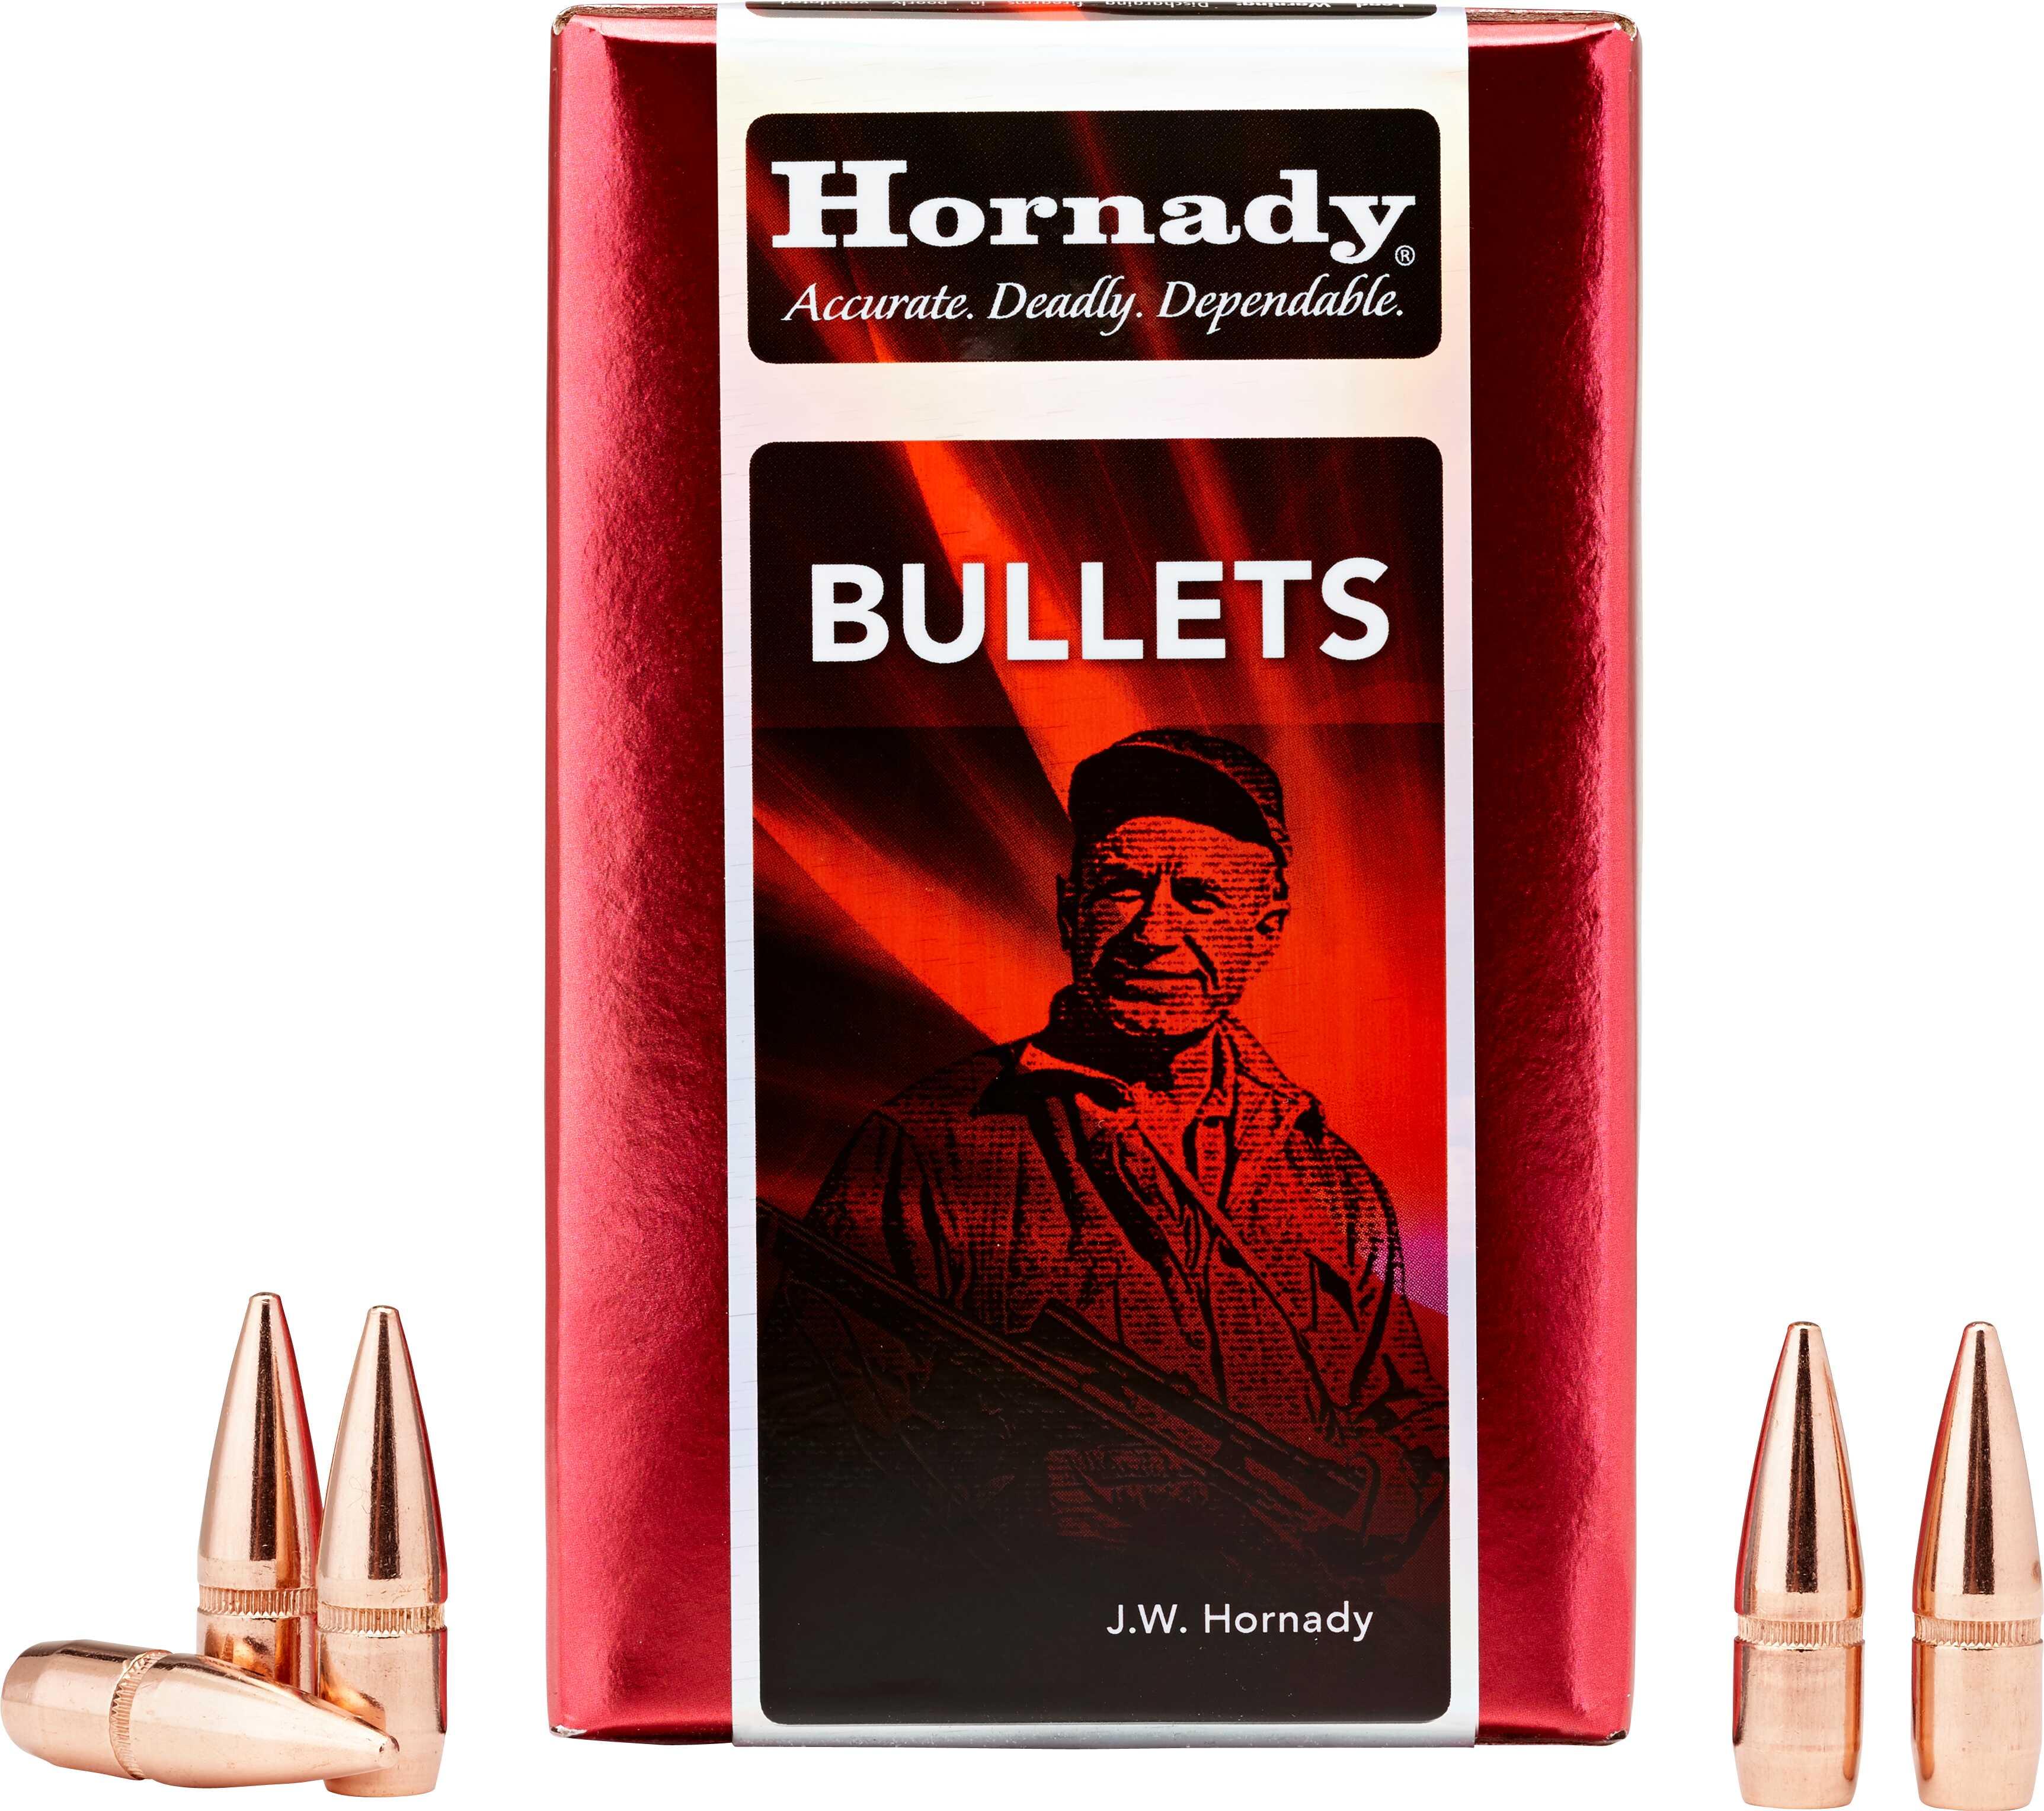 Hornady Rifle Bullet 35 Caliber 200 Grain Spire Point 100/Box Md: 3510